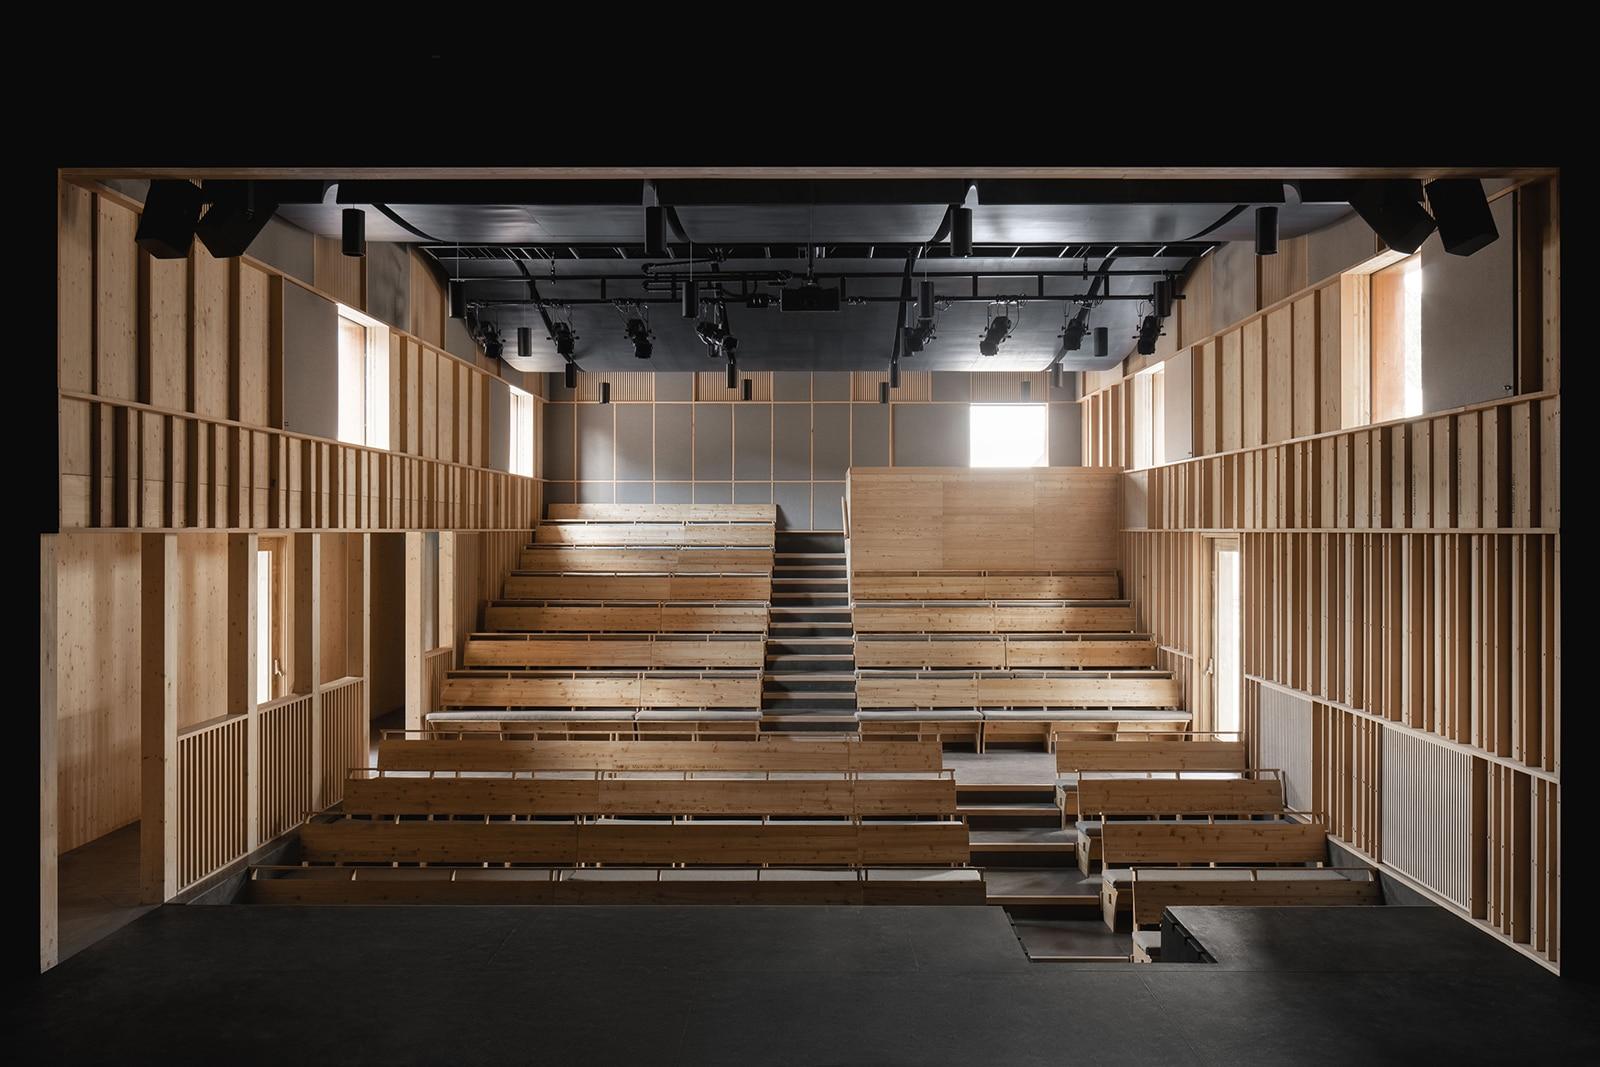 David Brownlow Theatre  - 4.2 Nick Dearden 1 41